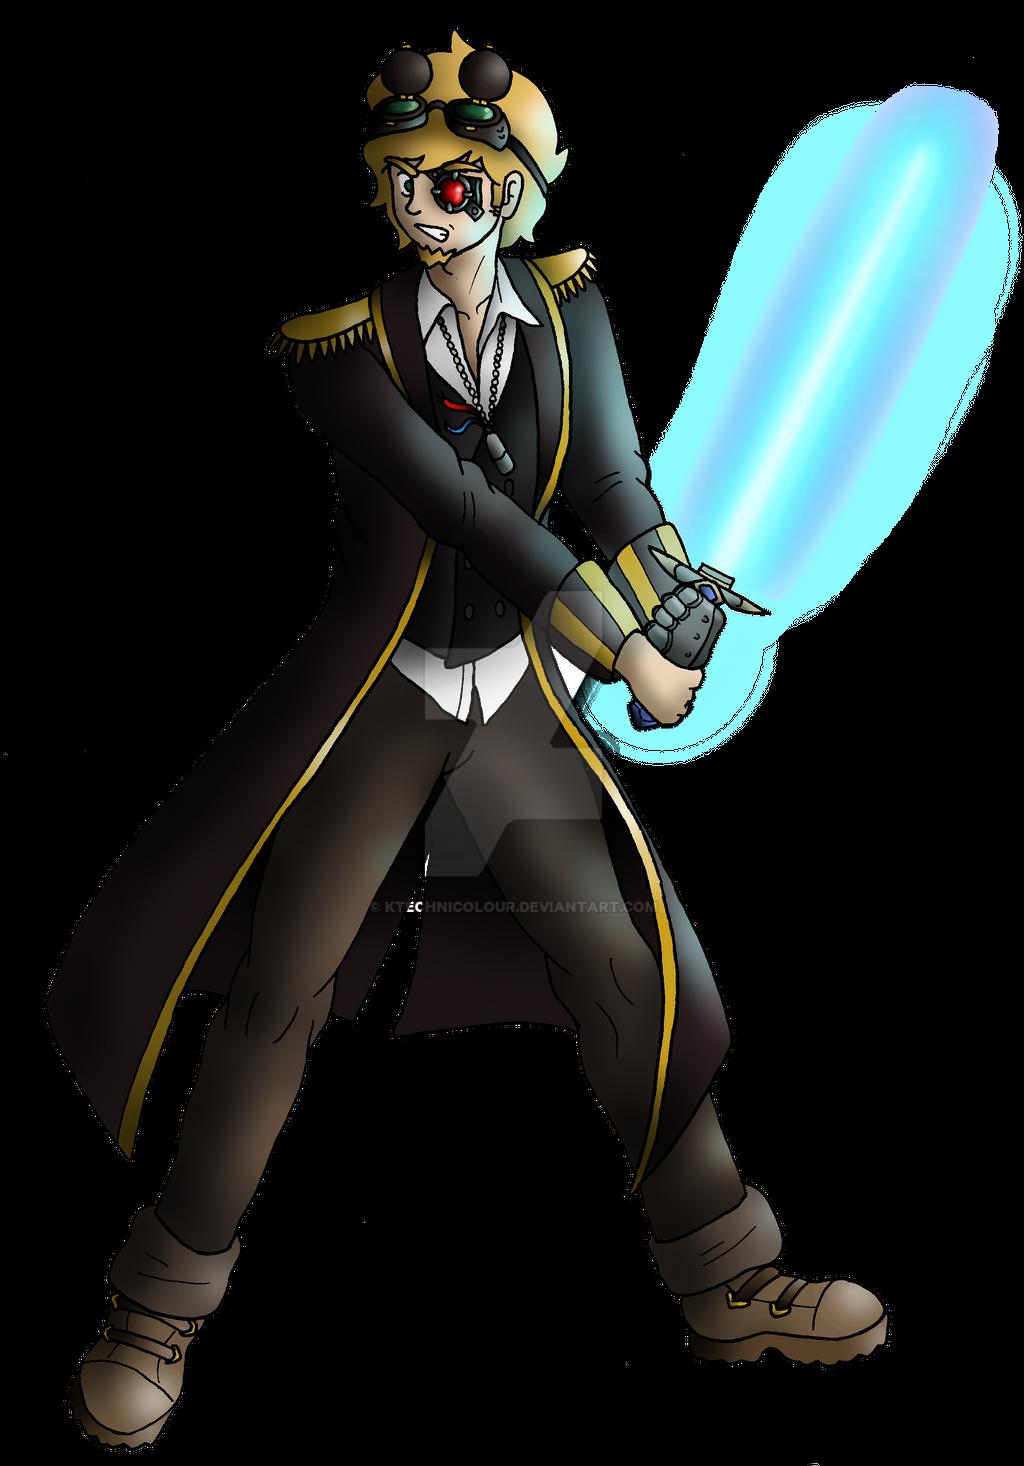 Captain Basil Longshorts by KTechnicolour